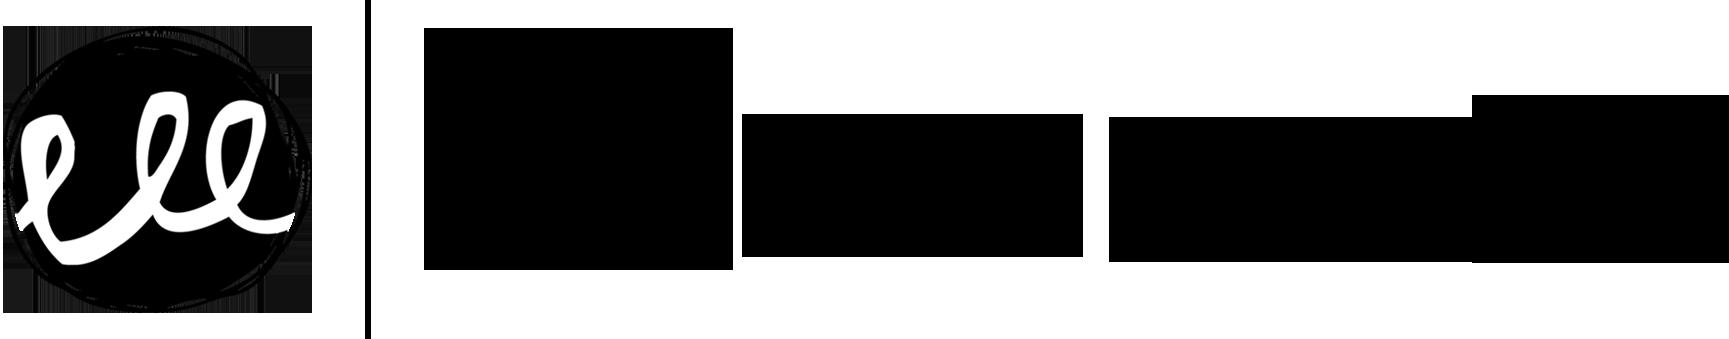 Roben-marie logo